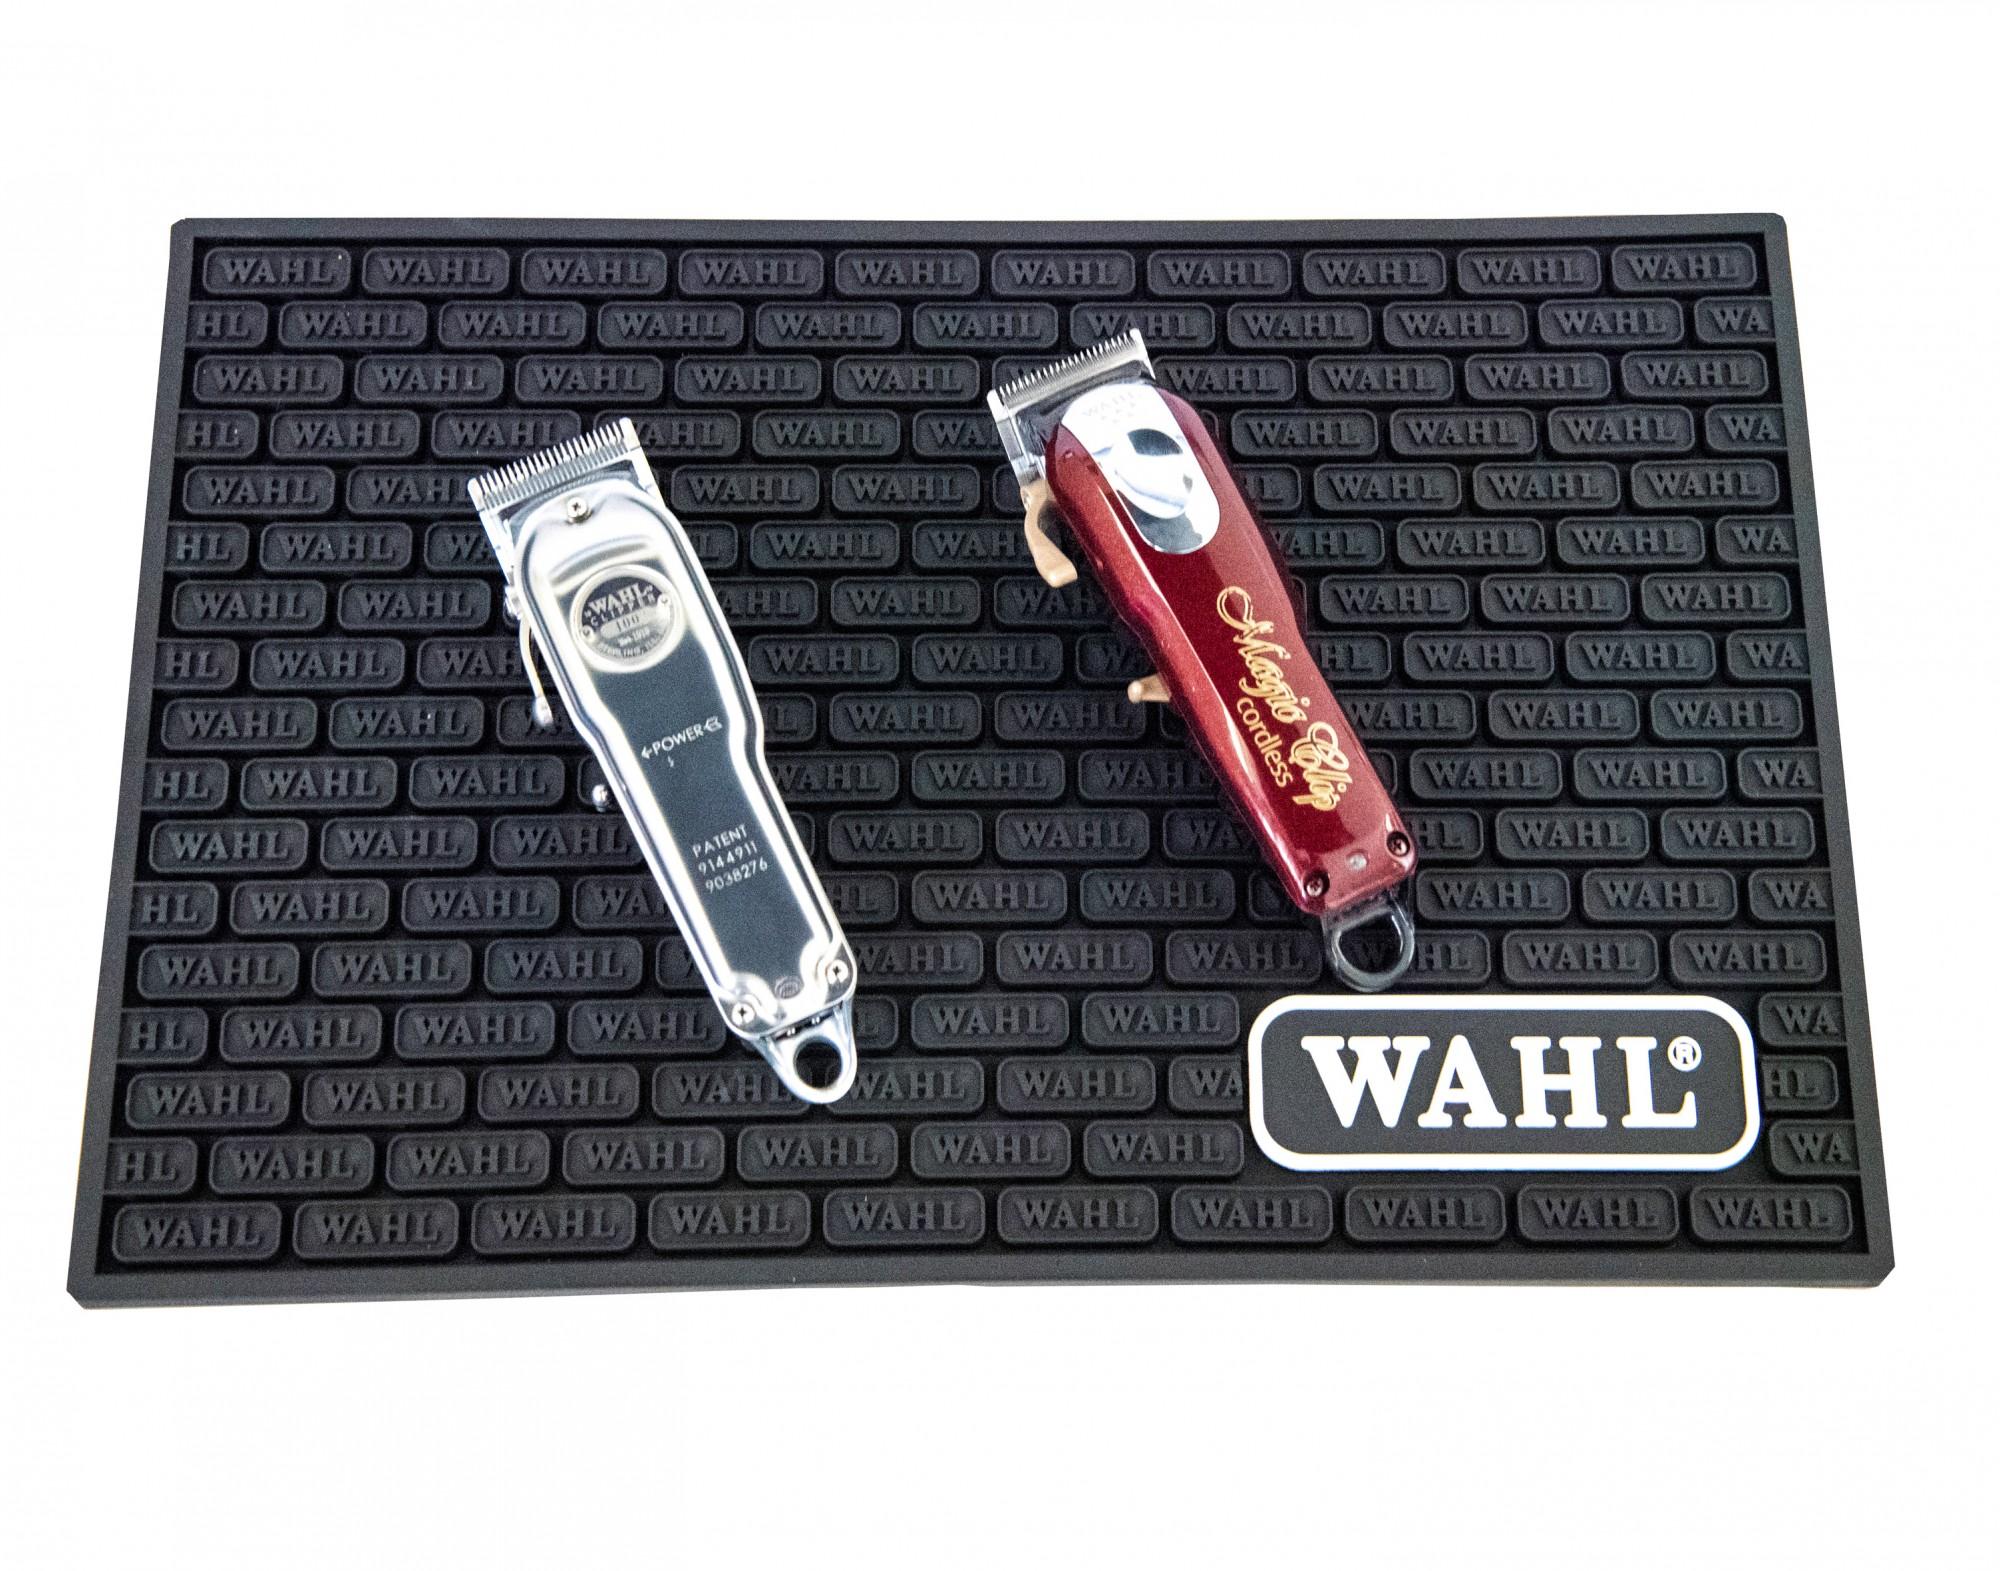 wahl-0093-6410-barber-tool-mat 2